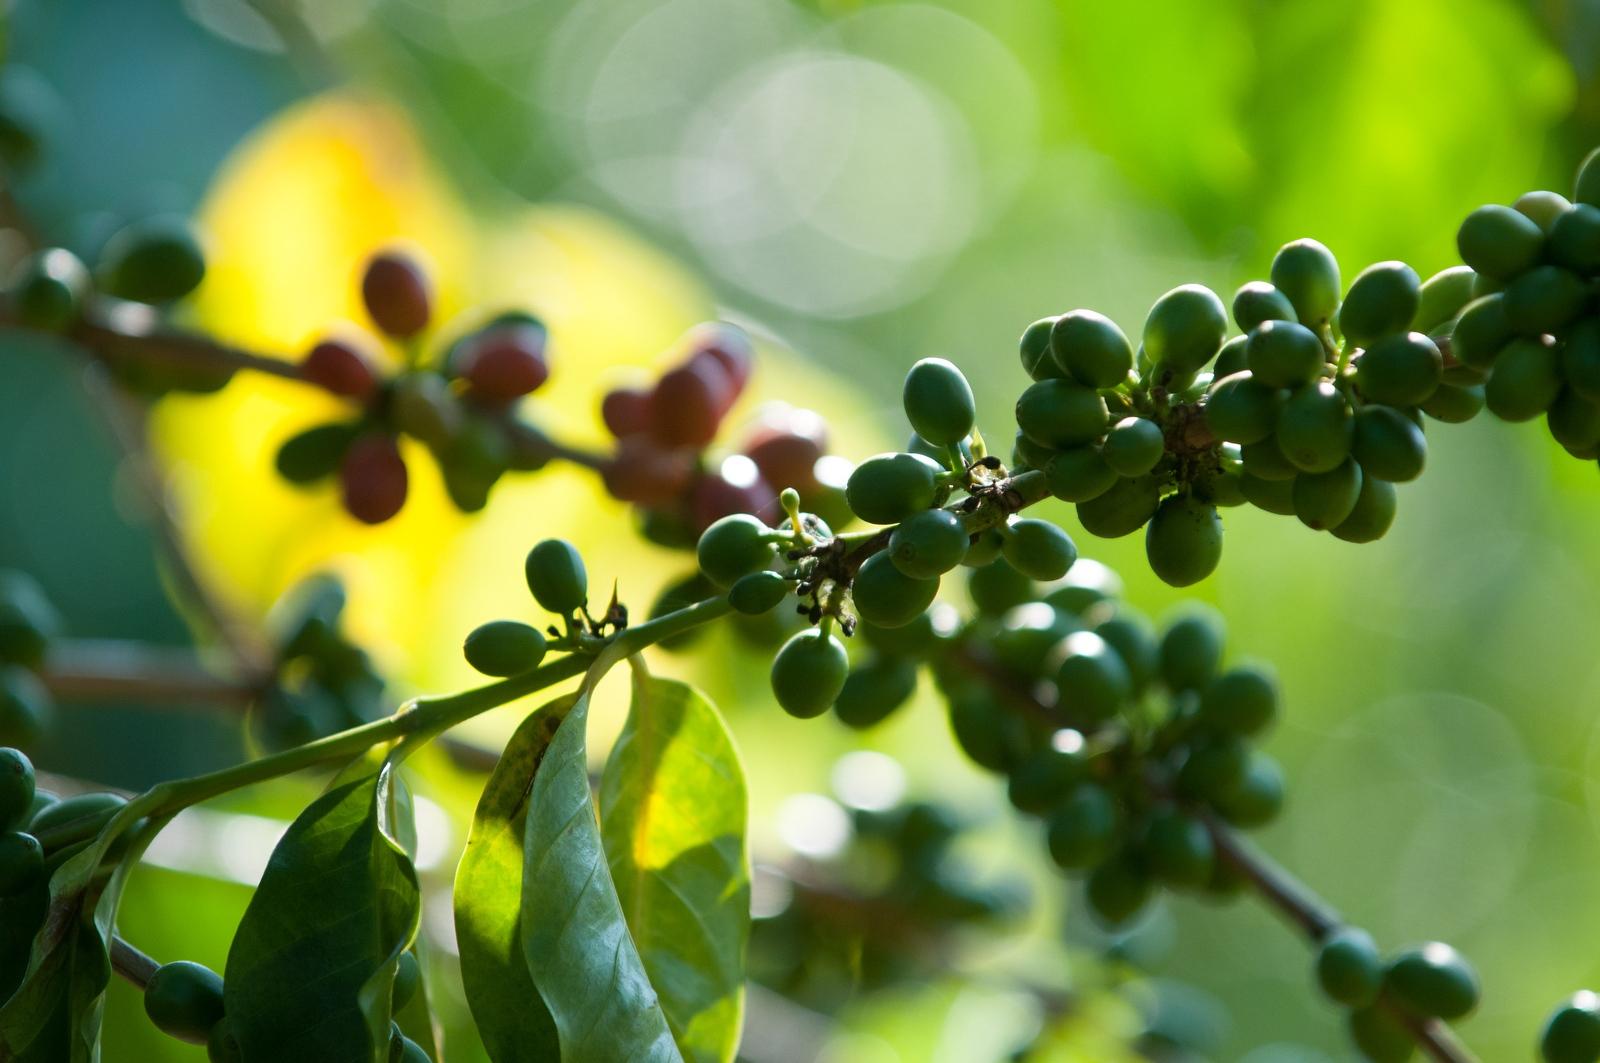 Coffee cherries on coffee trees, Greenwell Farms, Kona, Hawaii.